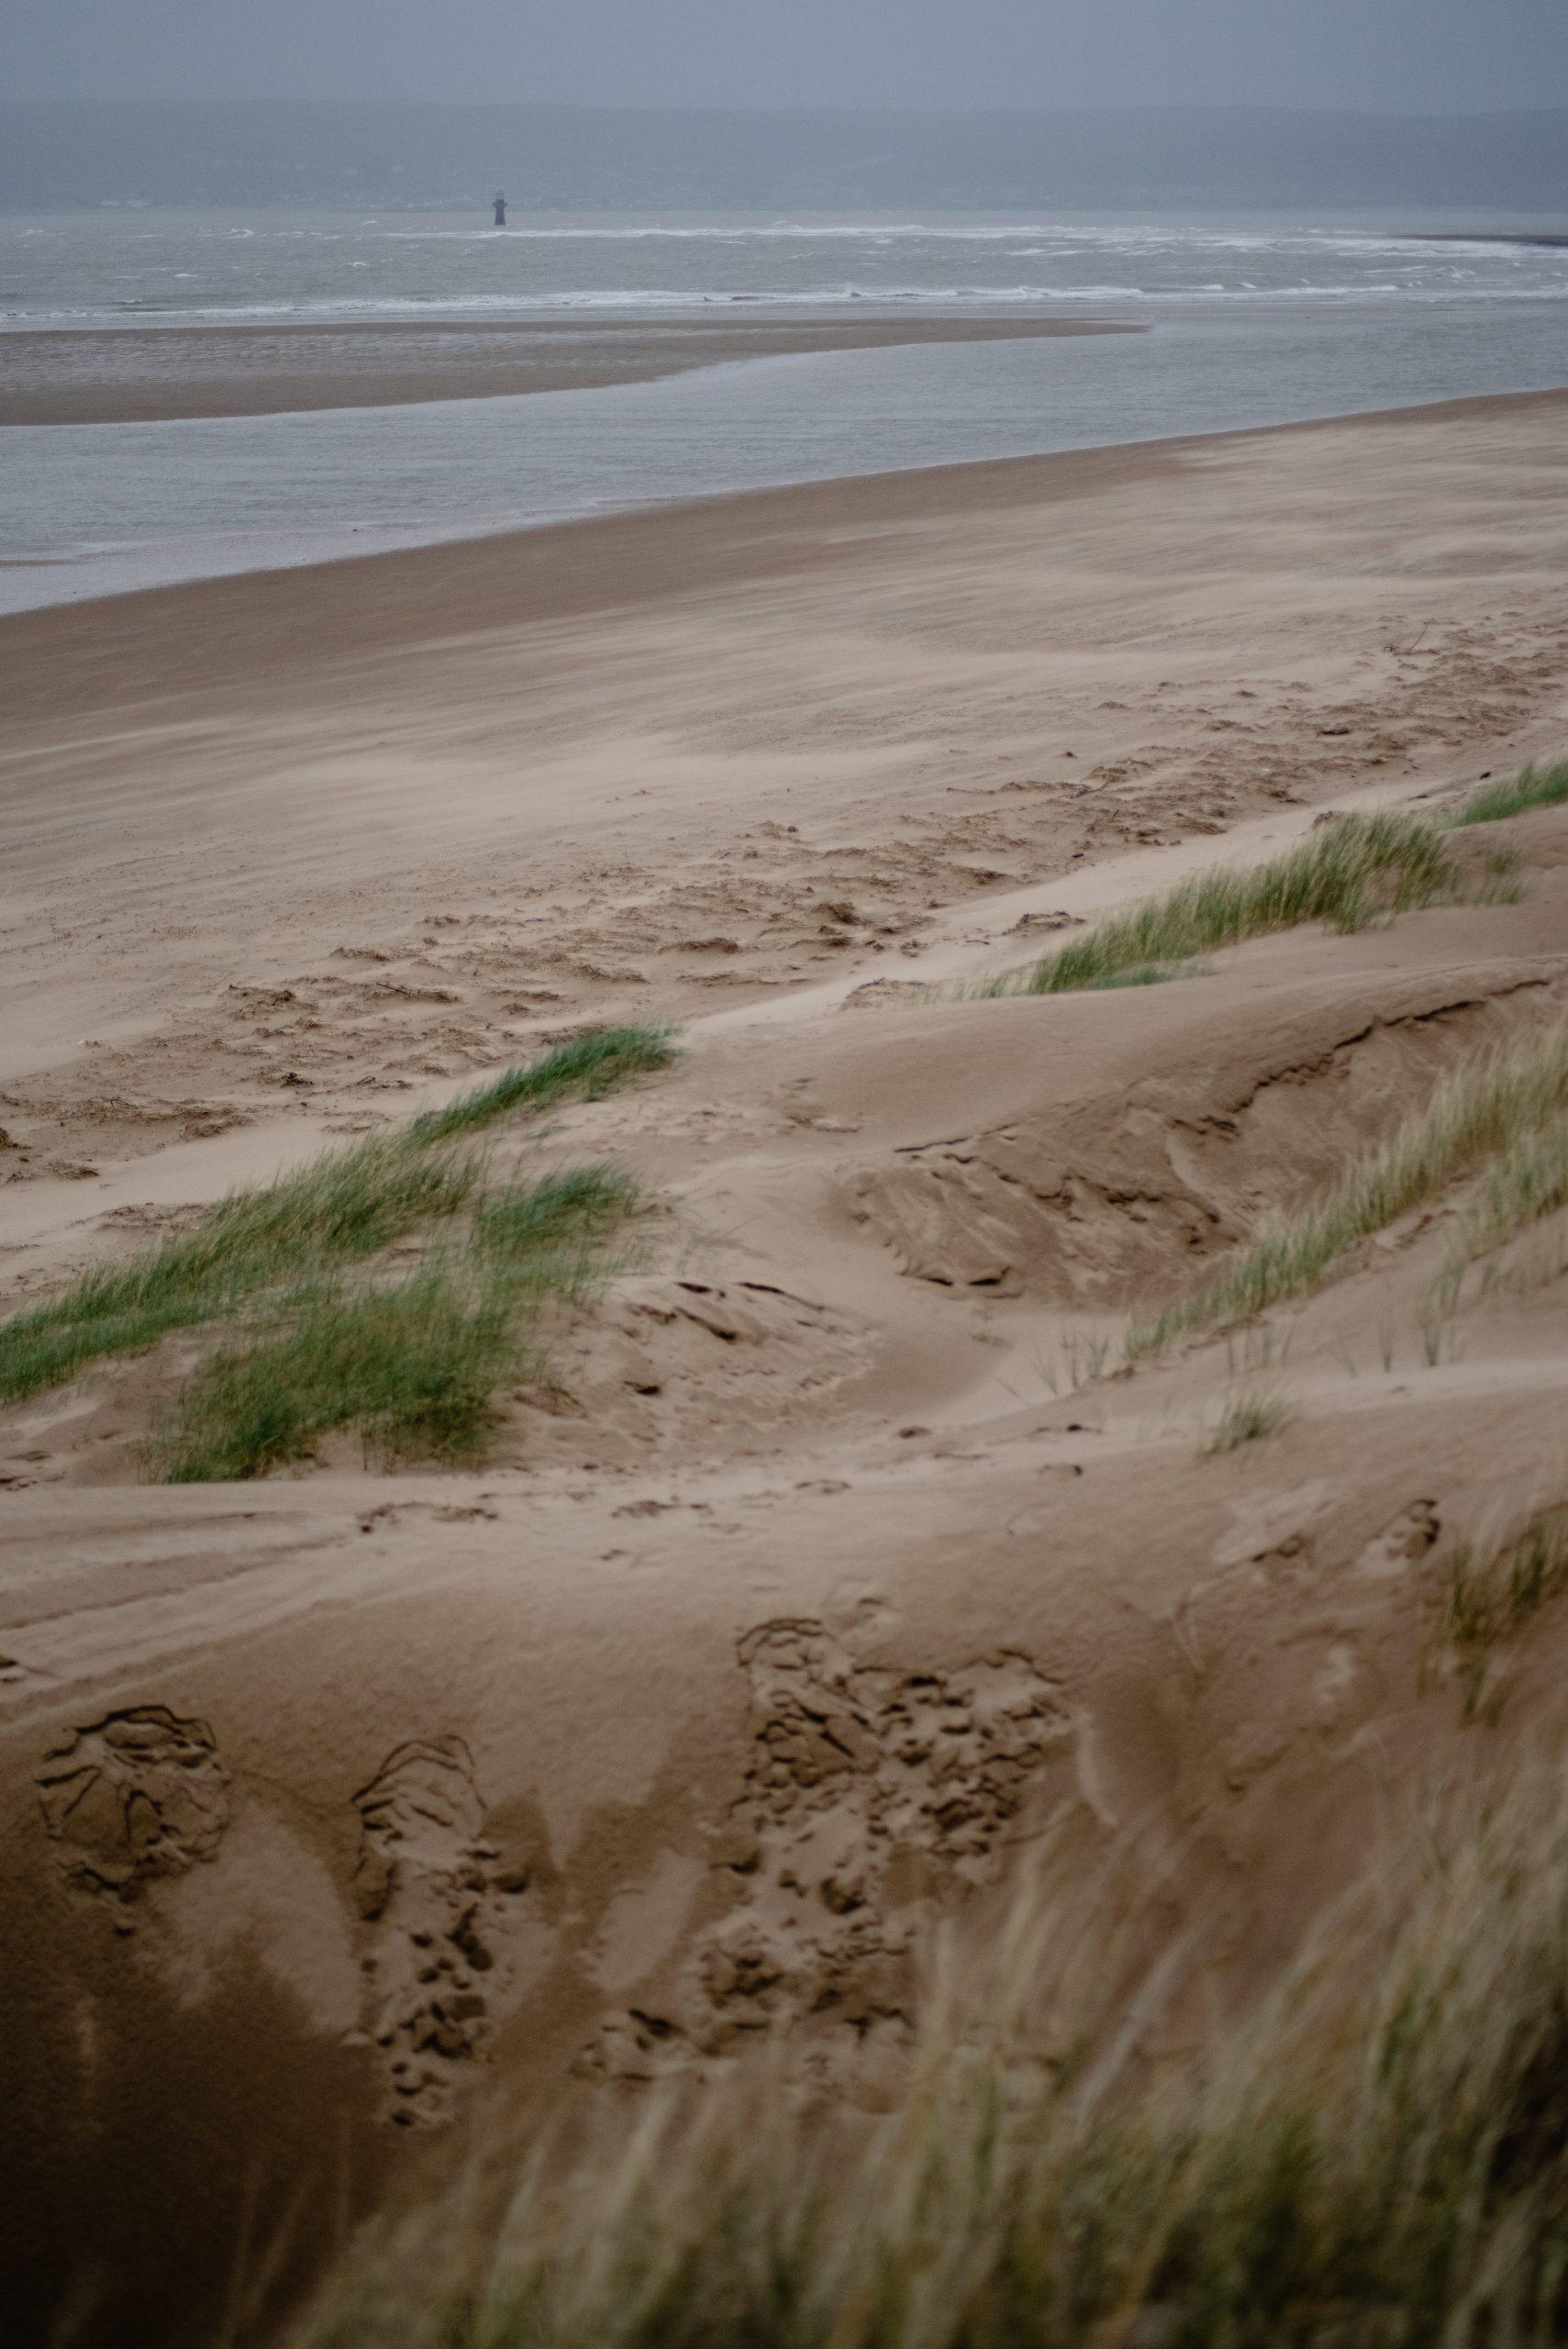 Llanmadoc Beach - Whitford Point Gower Peninsula Ben Holbrook